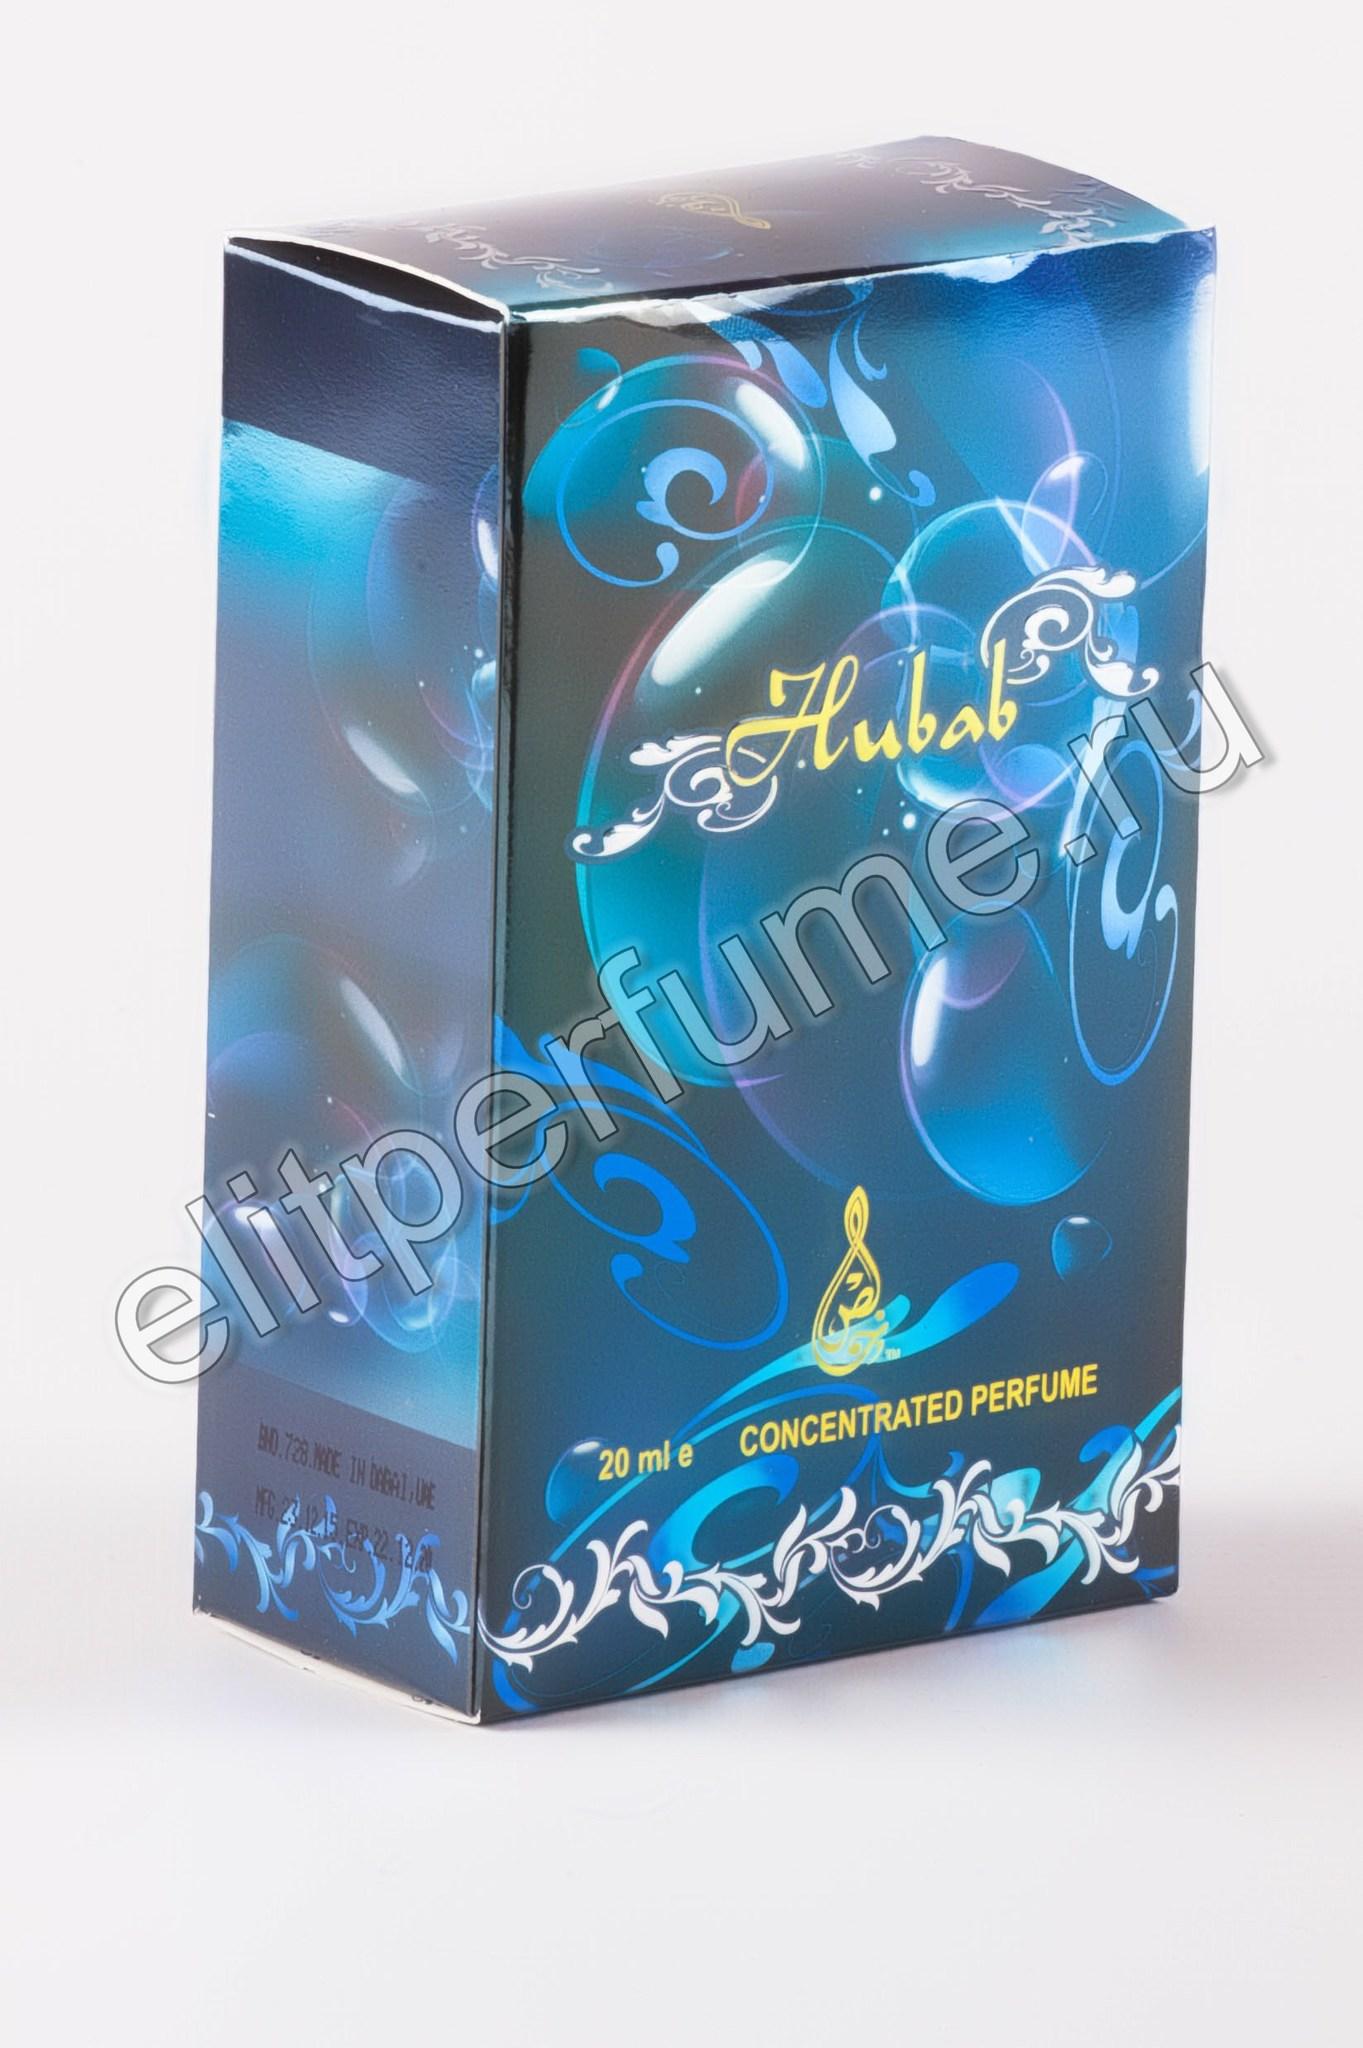 Hubab Хубаб 20 мл арабские масляные духи от Халис Khalis Perfumes